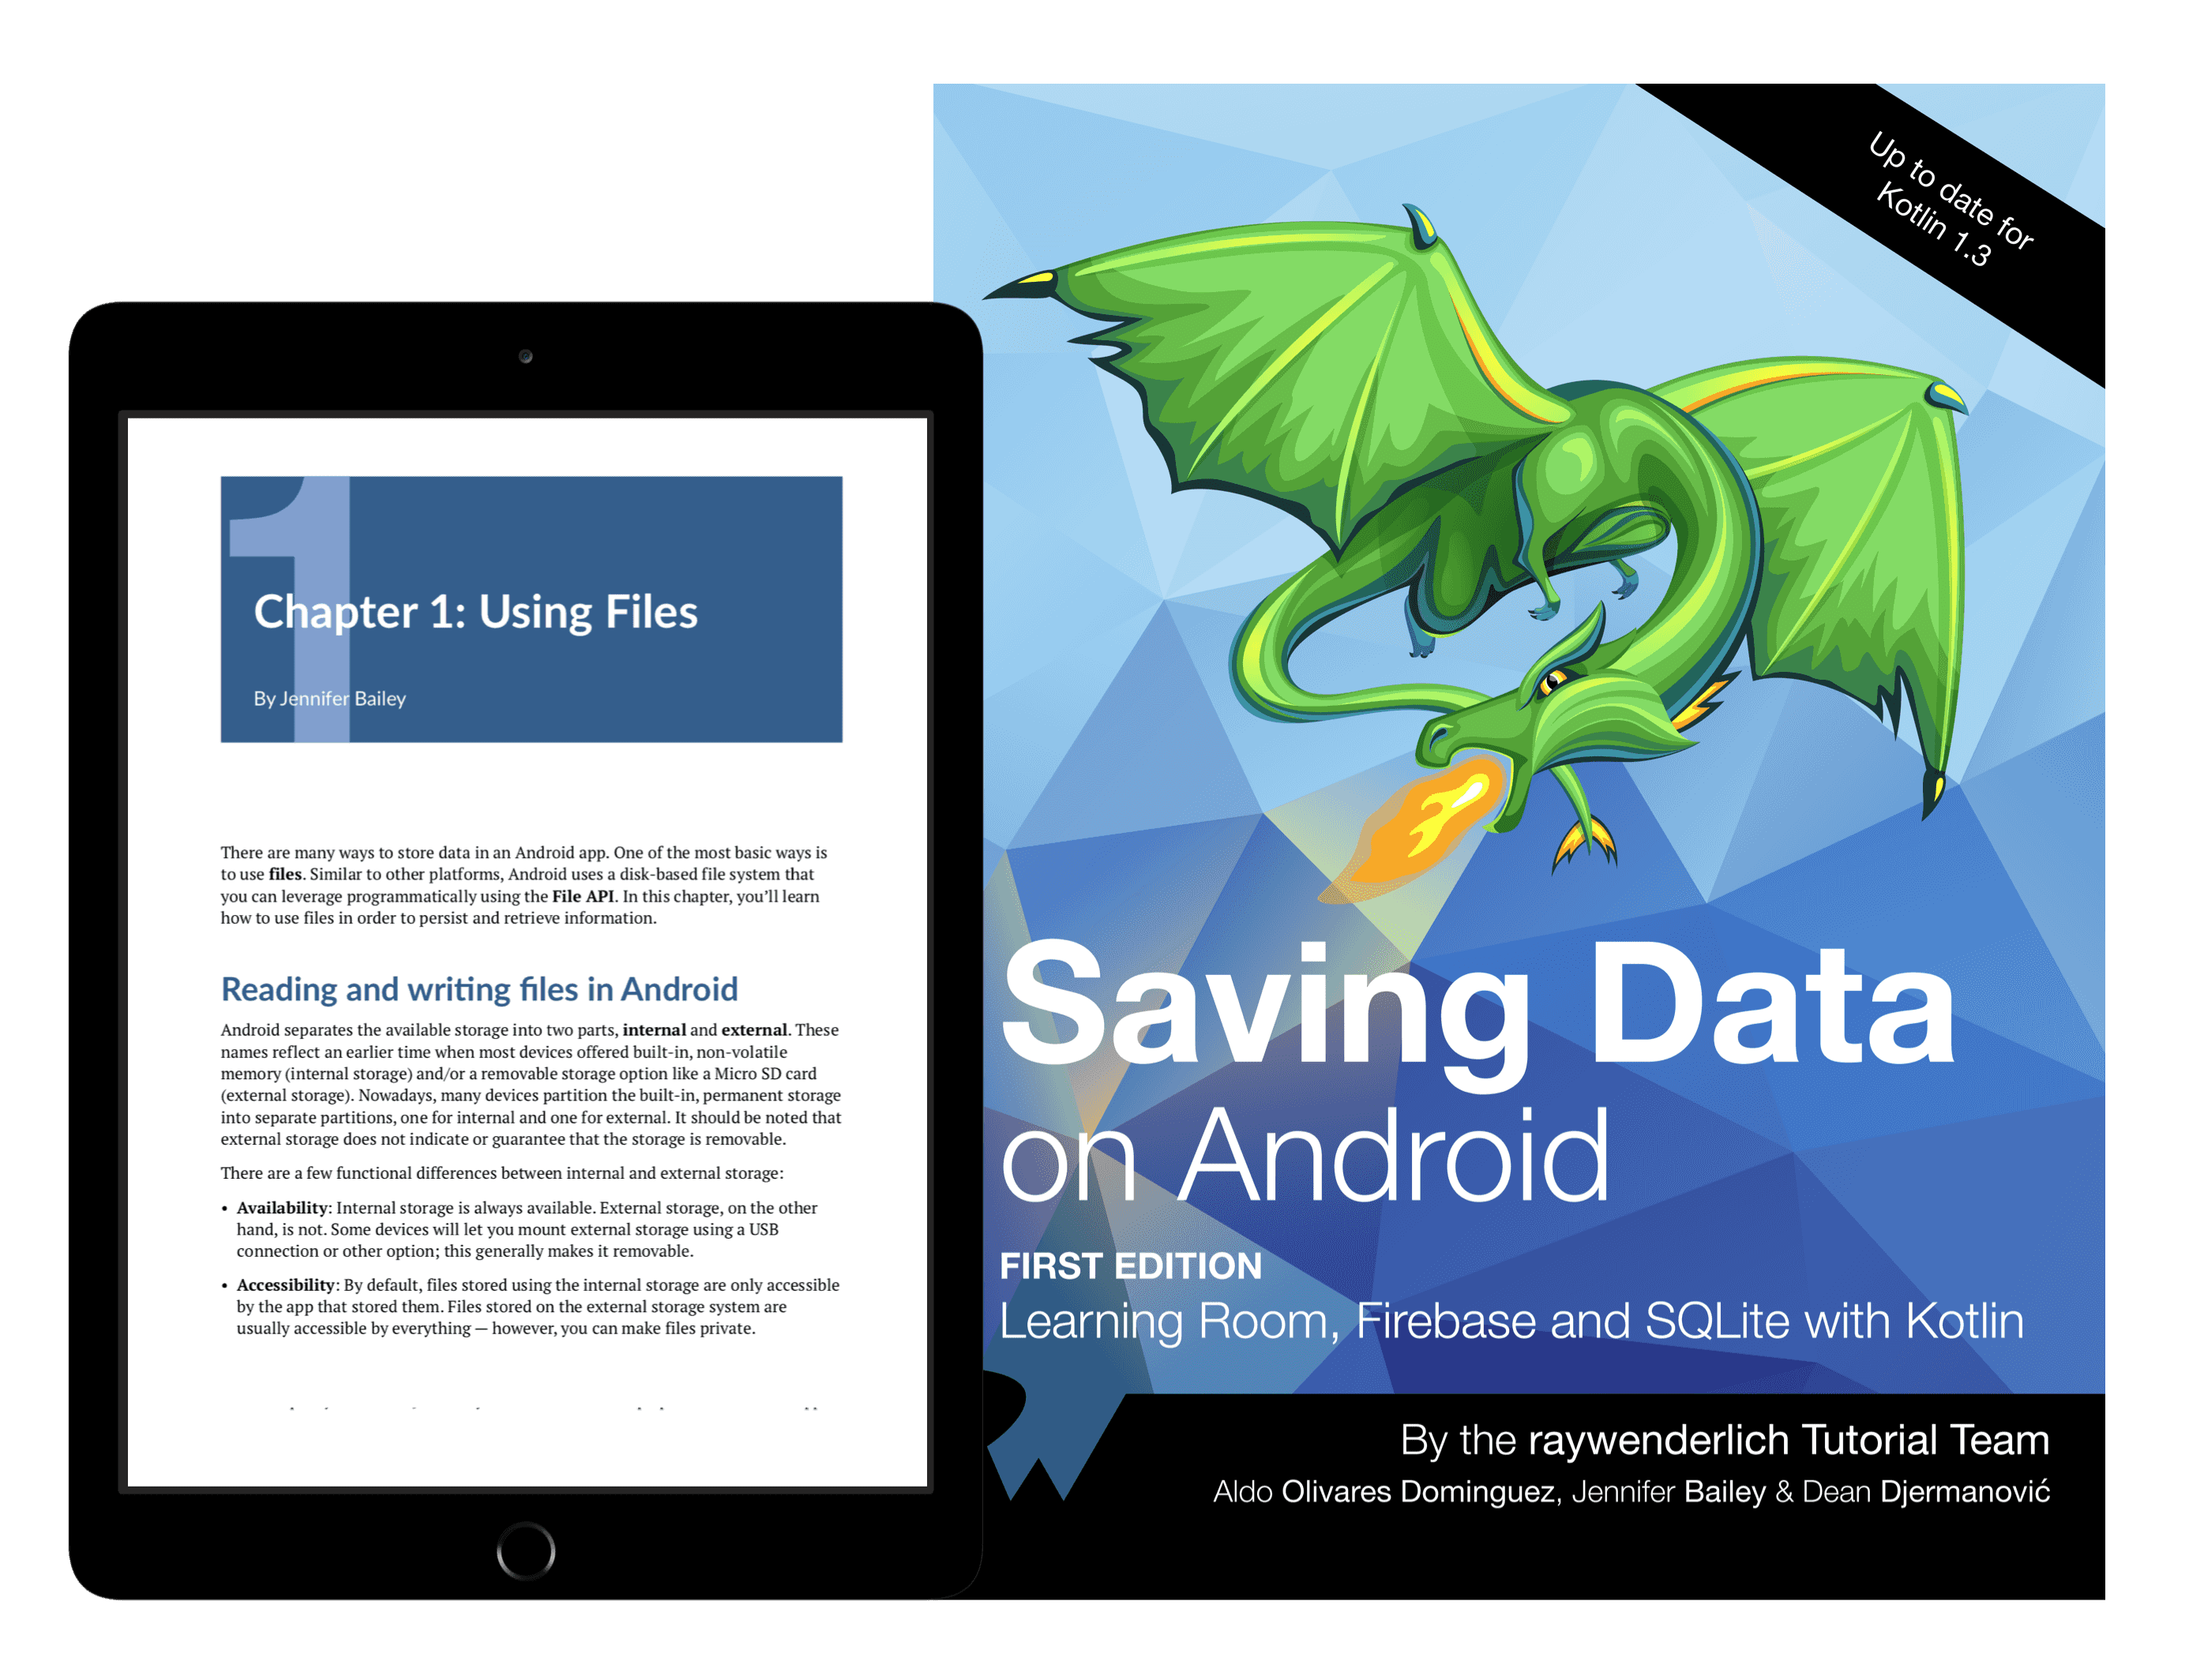 Saving Data on Android